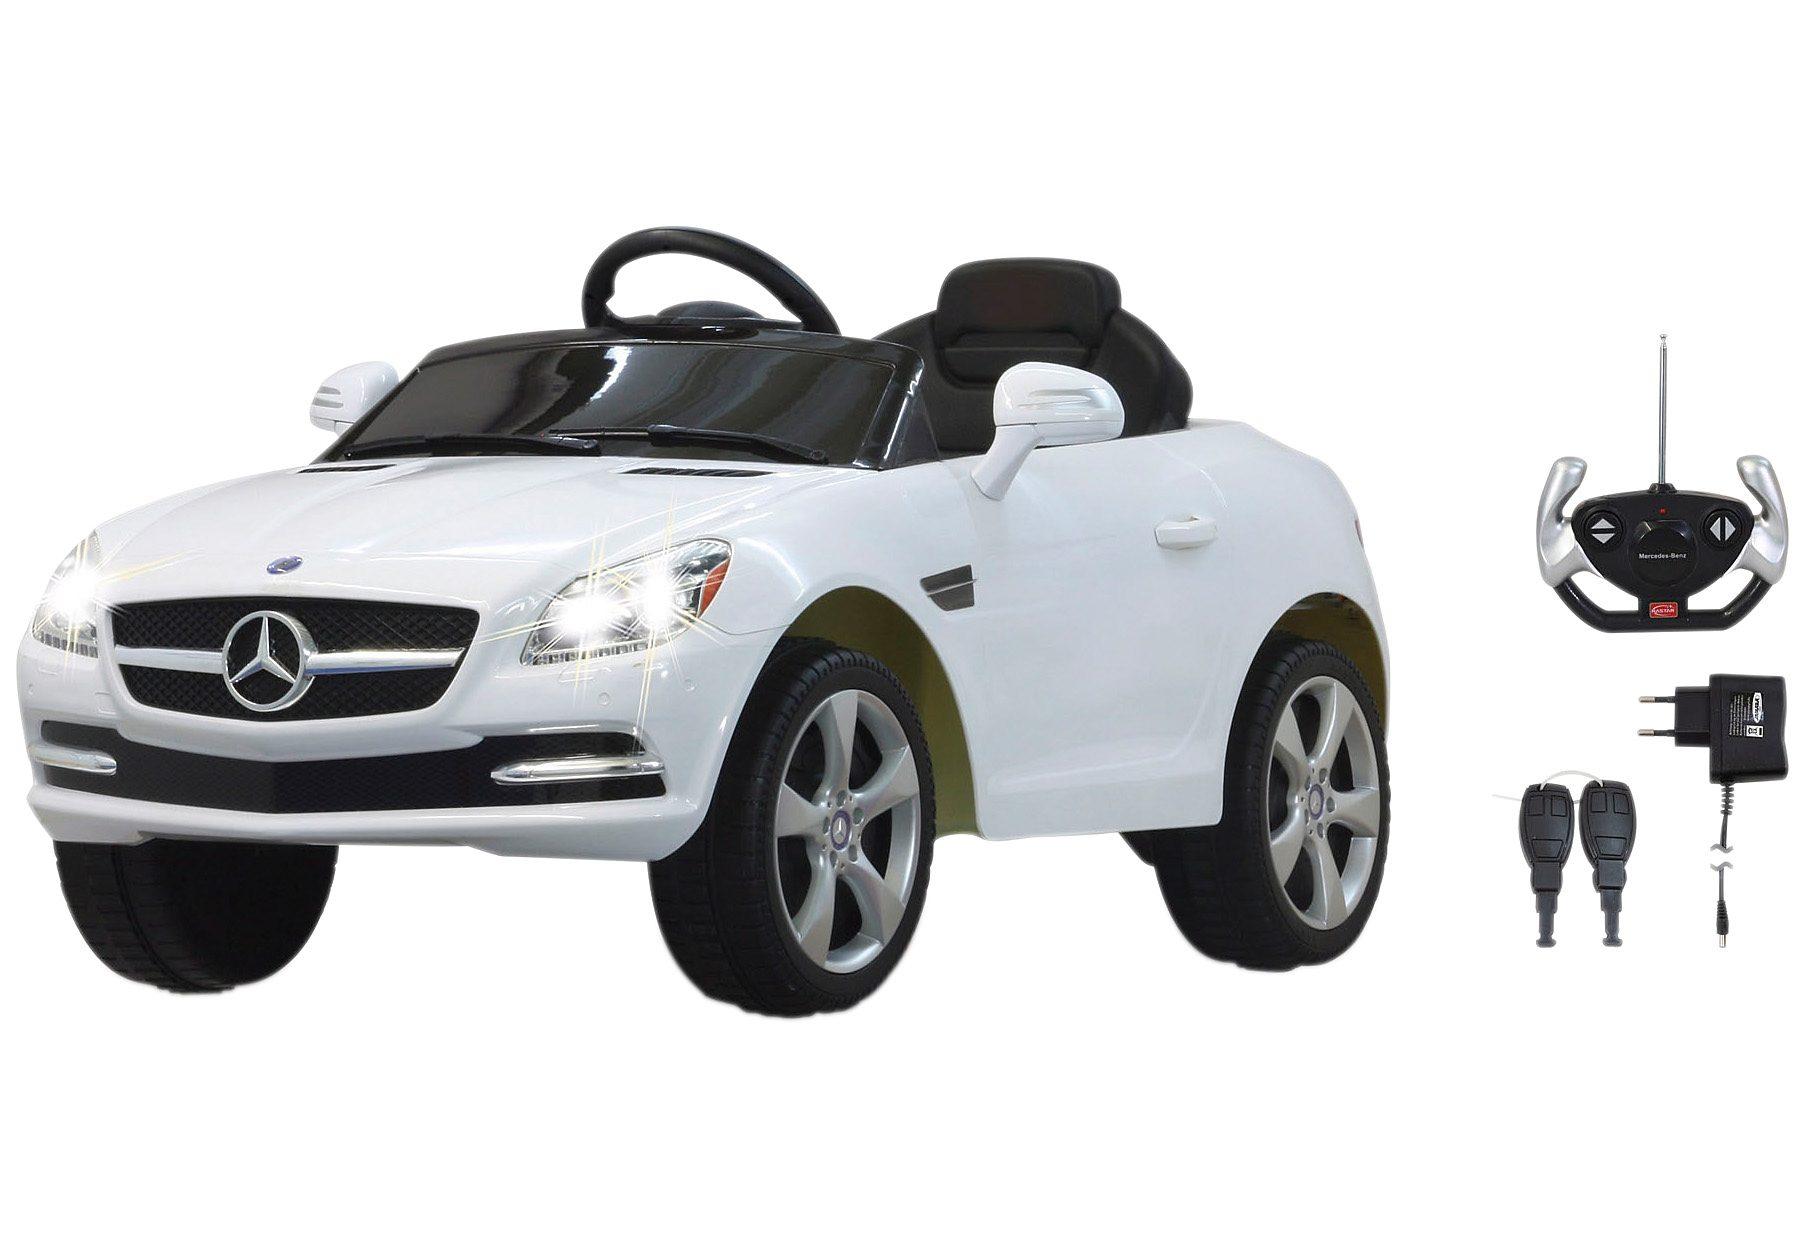 JAMARA Kinder-Fahrzeug, »JAMARA KIDS Ride-On Mercedes Benz SLK«